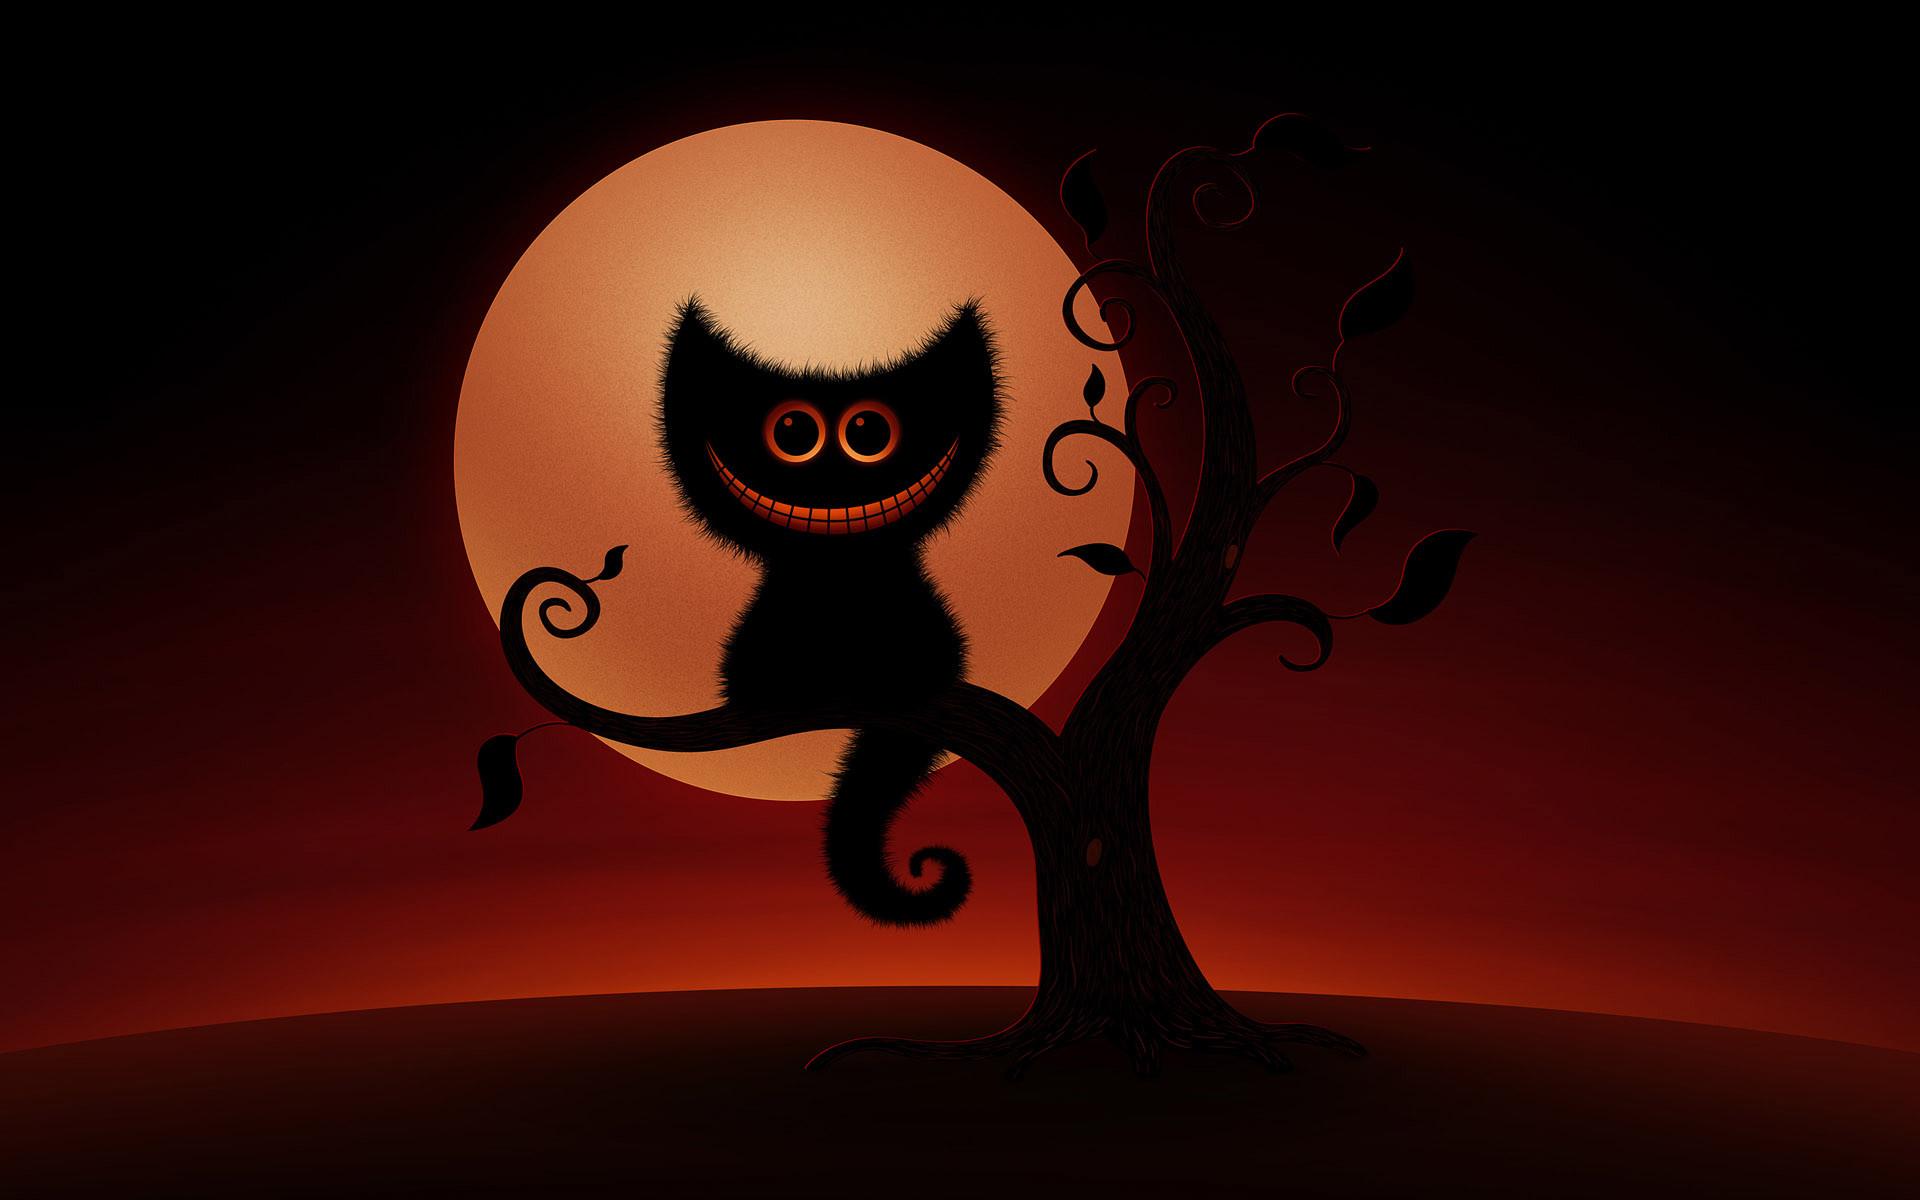 Download Wallpaper Halloween Iphone 5 - 304863  You Should Have_52616.jpg